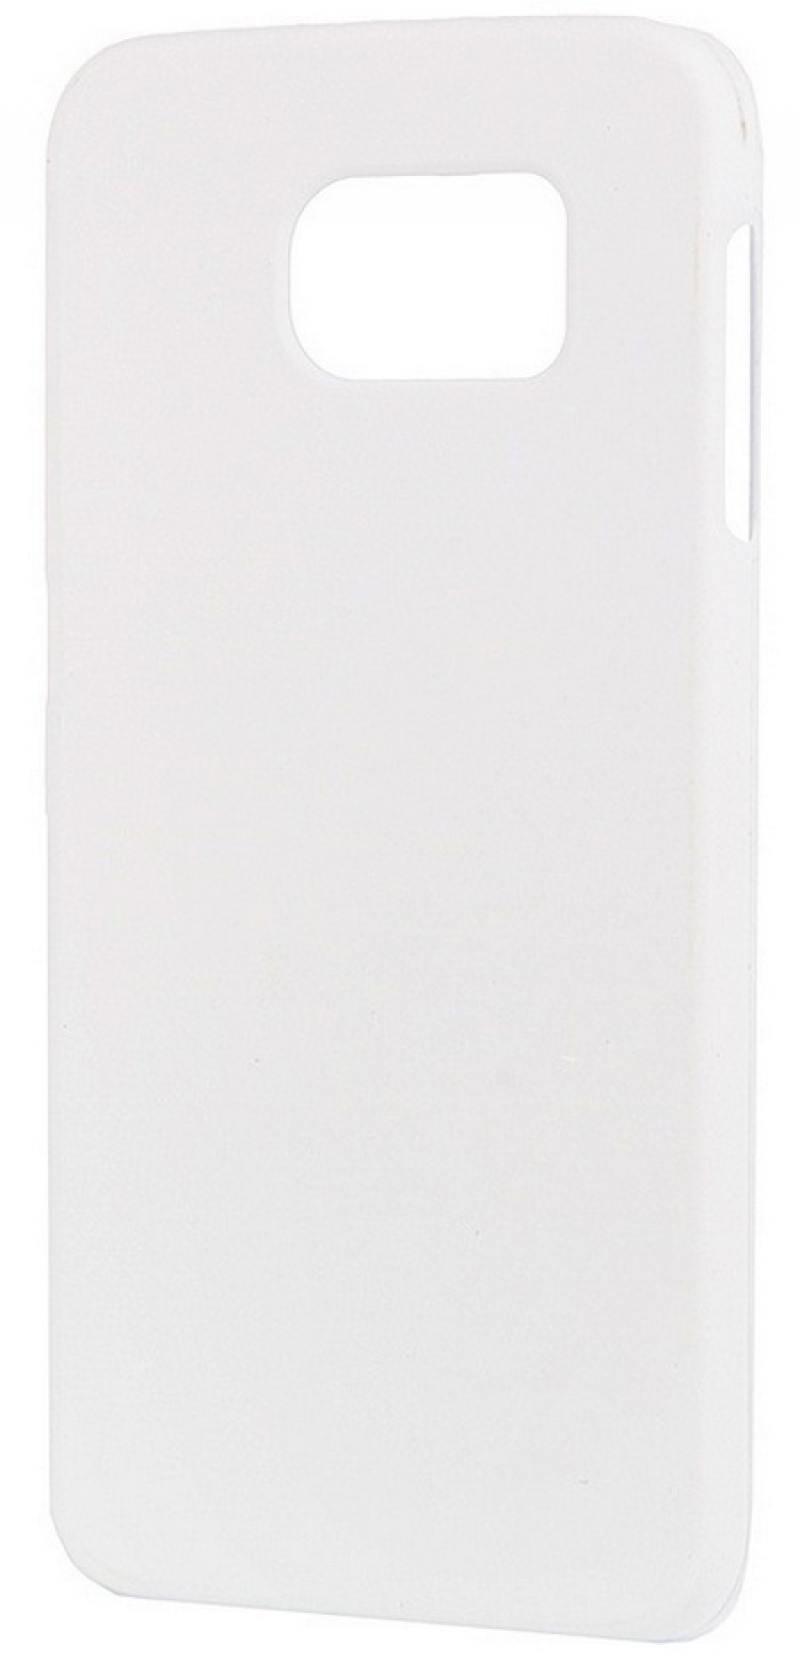 Чехол-накладка для Samsung Galaxy S6 SM-G920F Pulsar CLIPCASE PC РСС0017 White клип-кейс, пластик samsung pc studio скачать